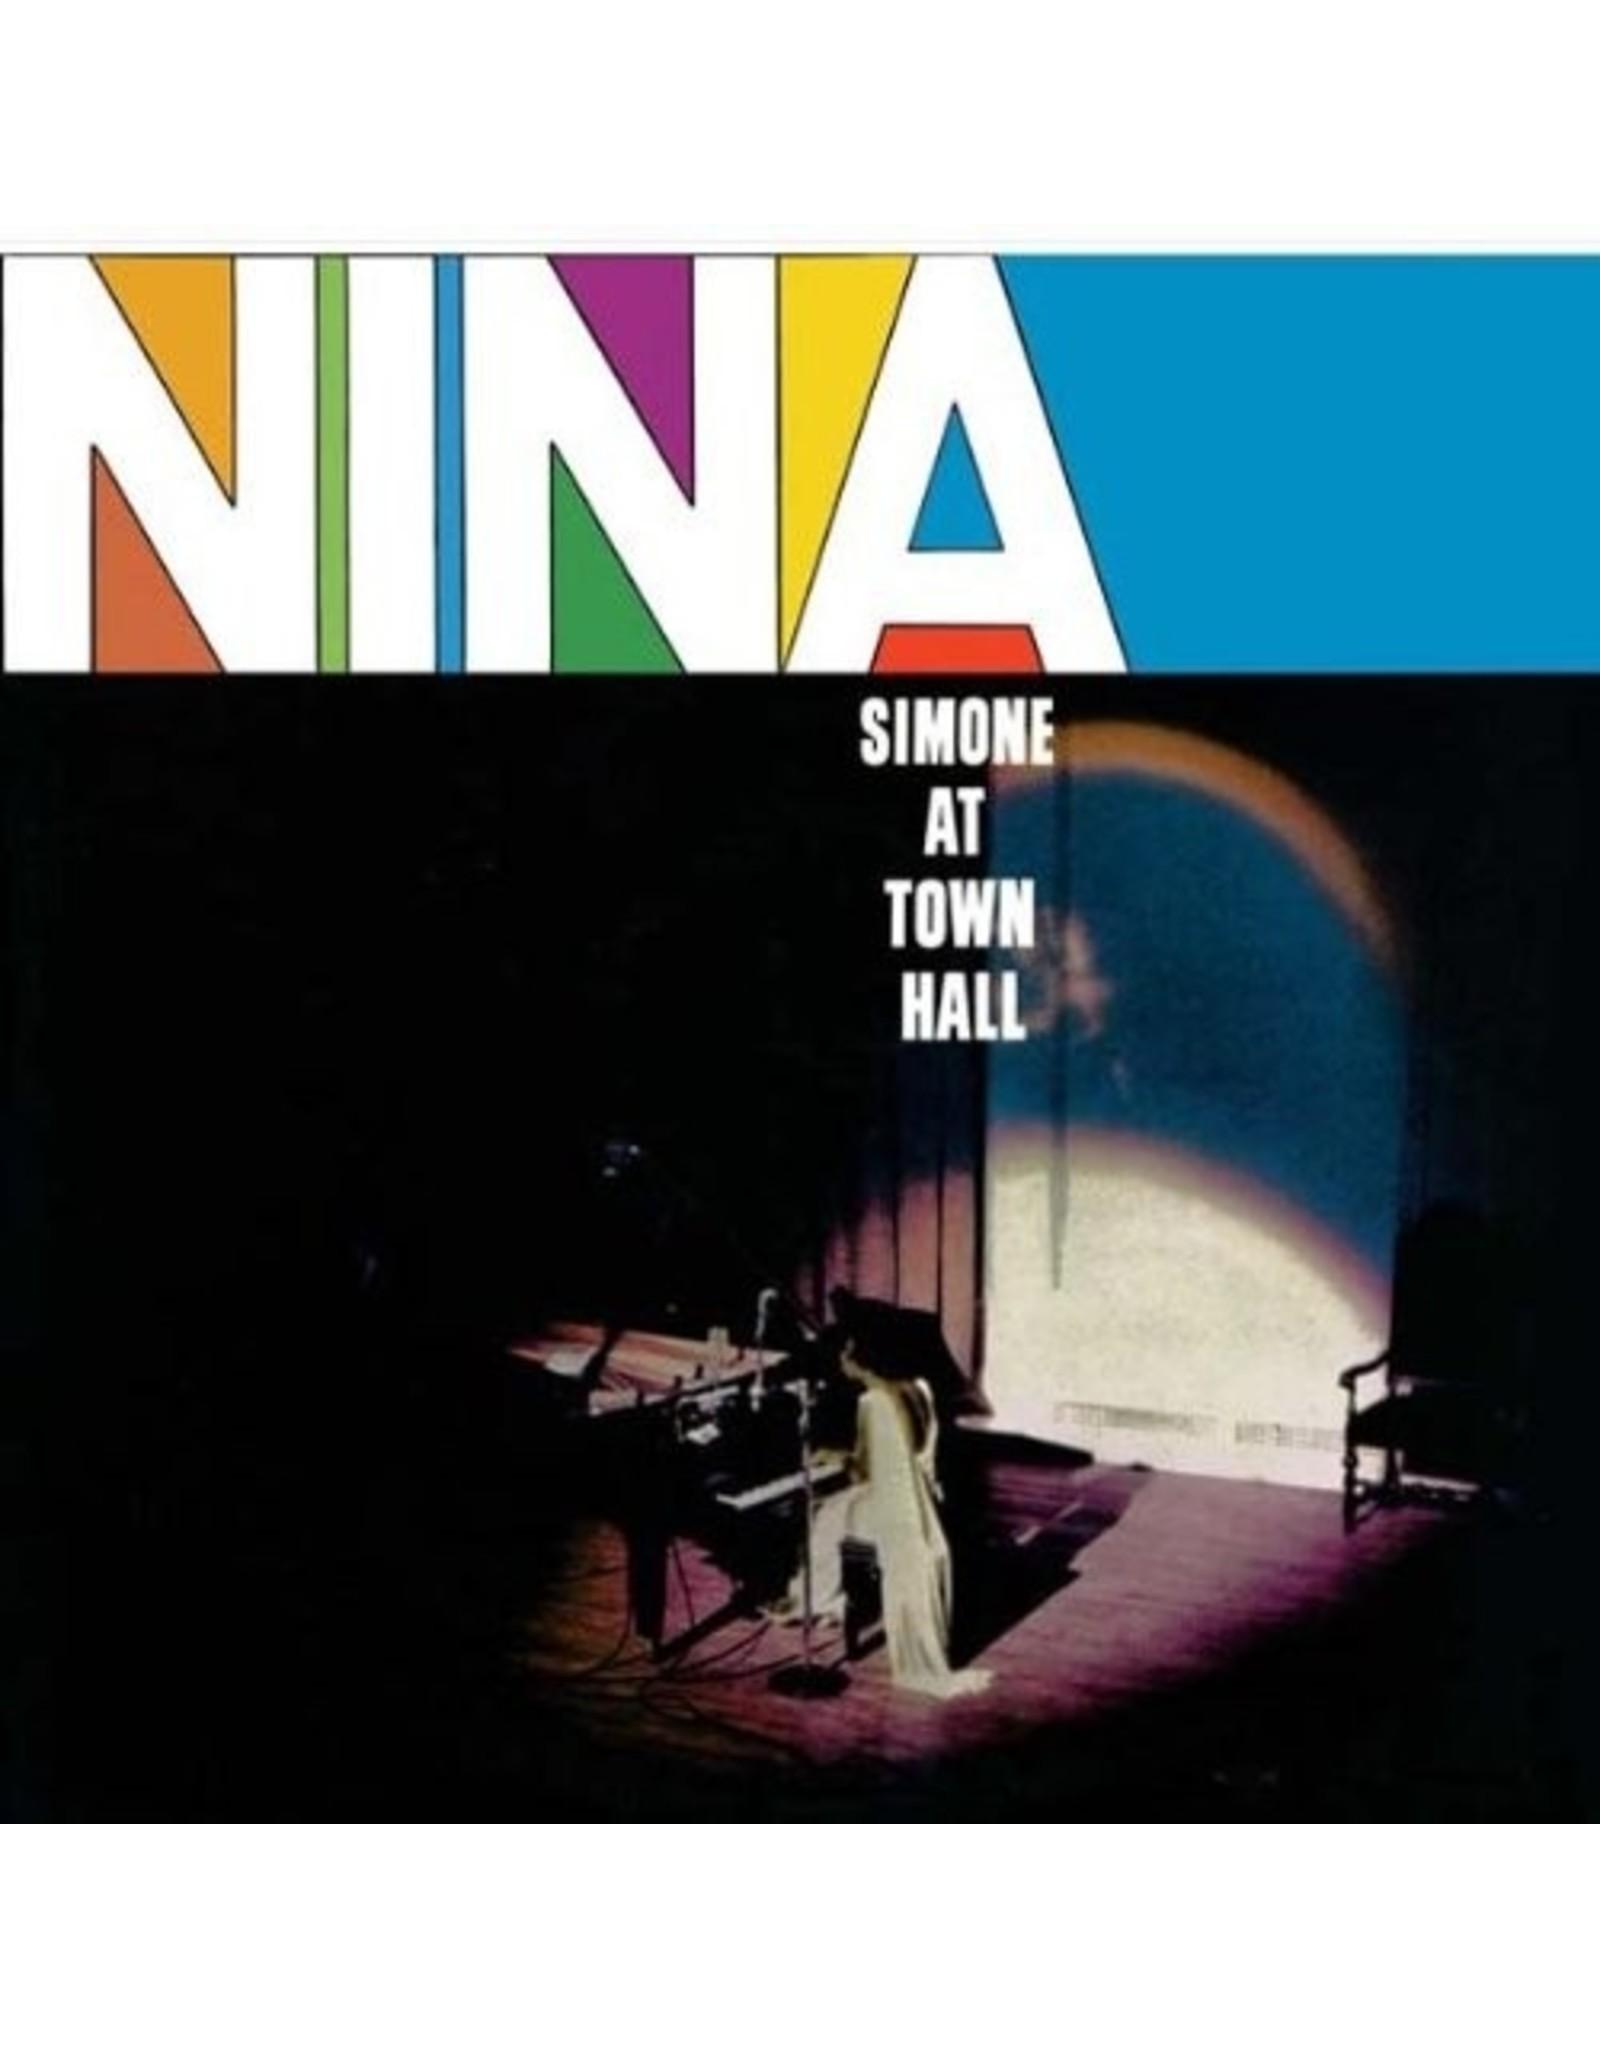 New Vinyl Nina Simone - At Town Hall LP